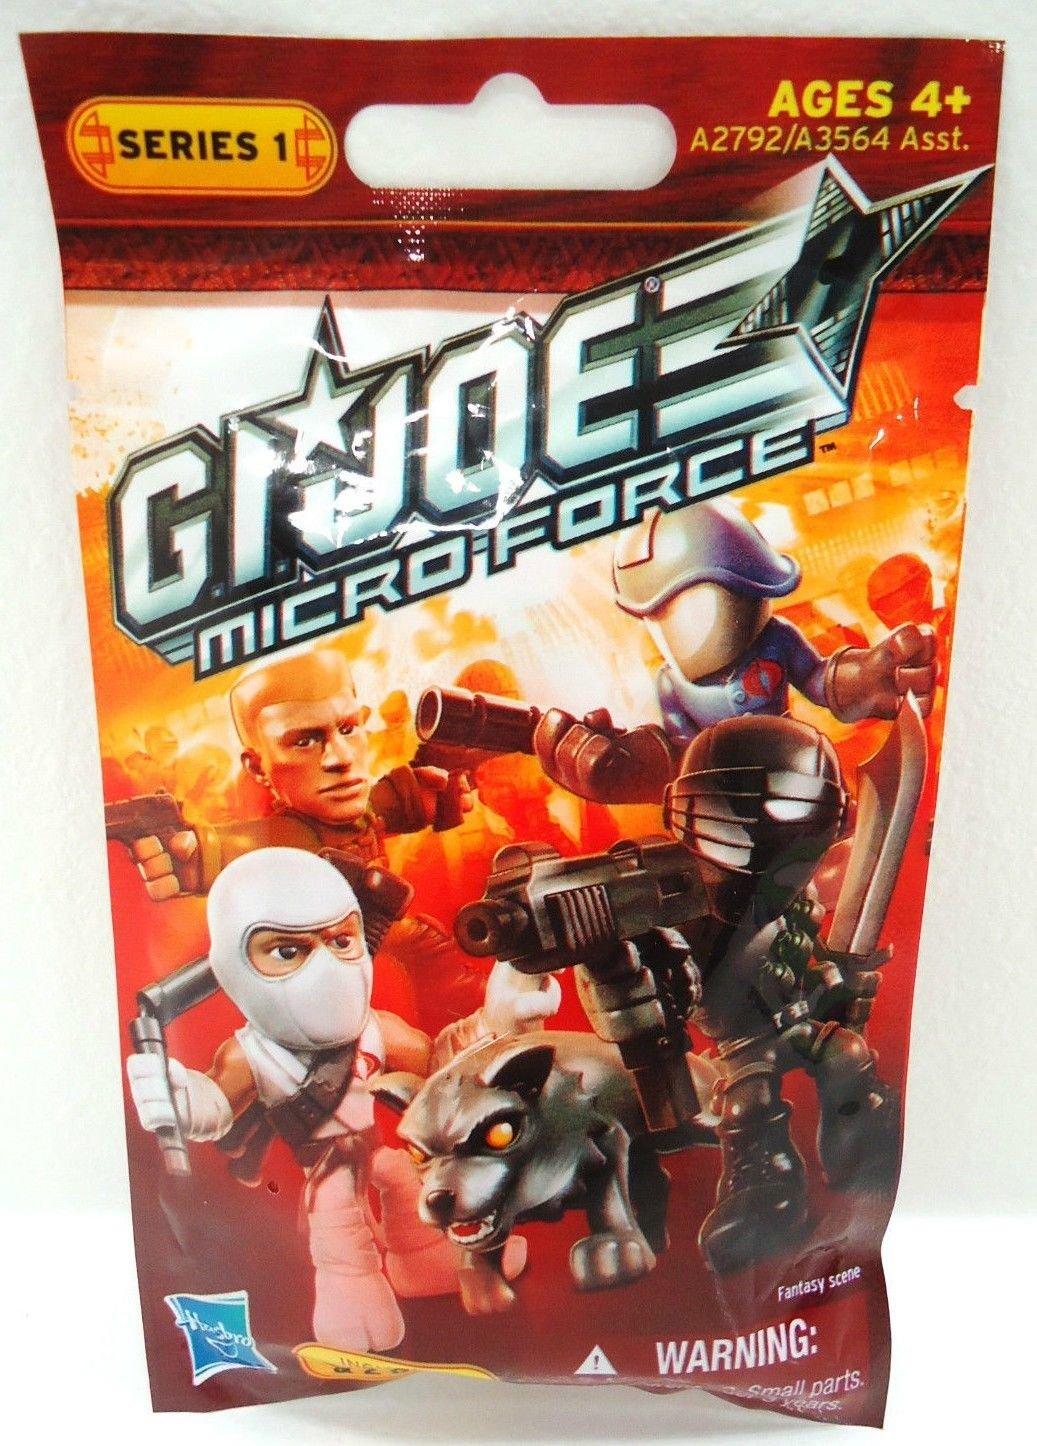 G.I. JOE - MICRO FORCE - SERIES 1 - BRAND NEW - SEALED - ACTION - FIGURE - COMIC